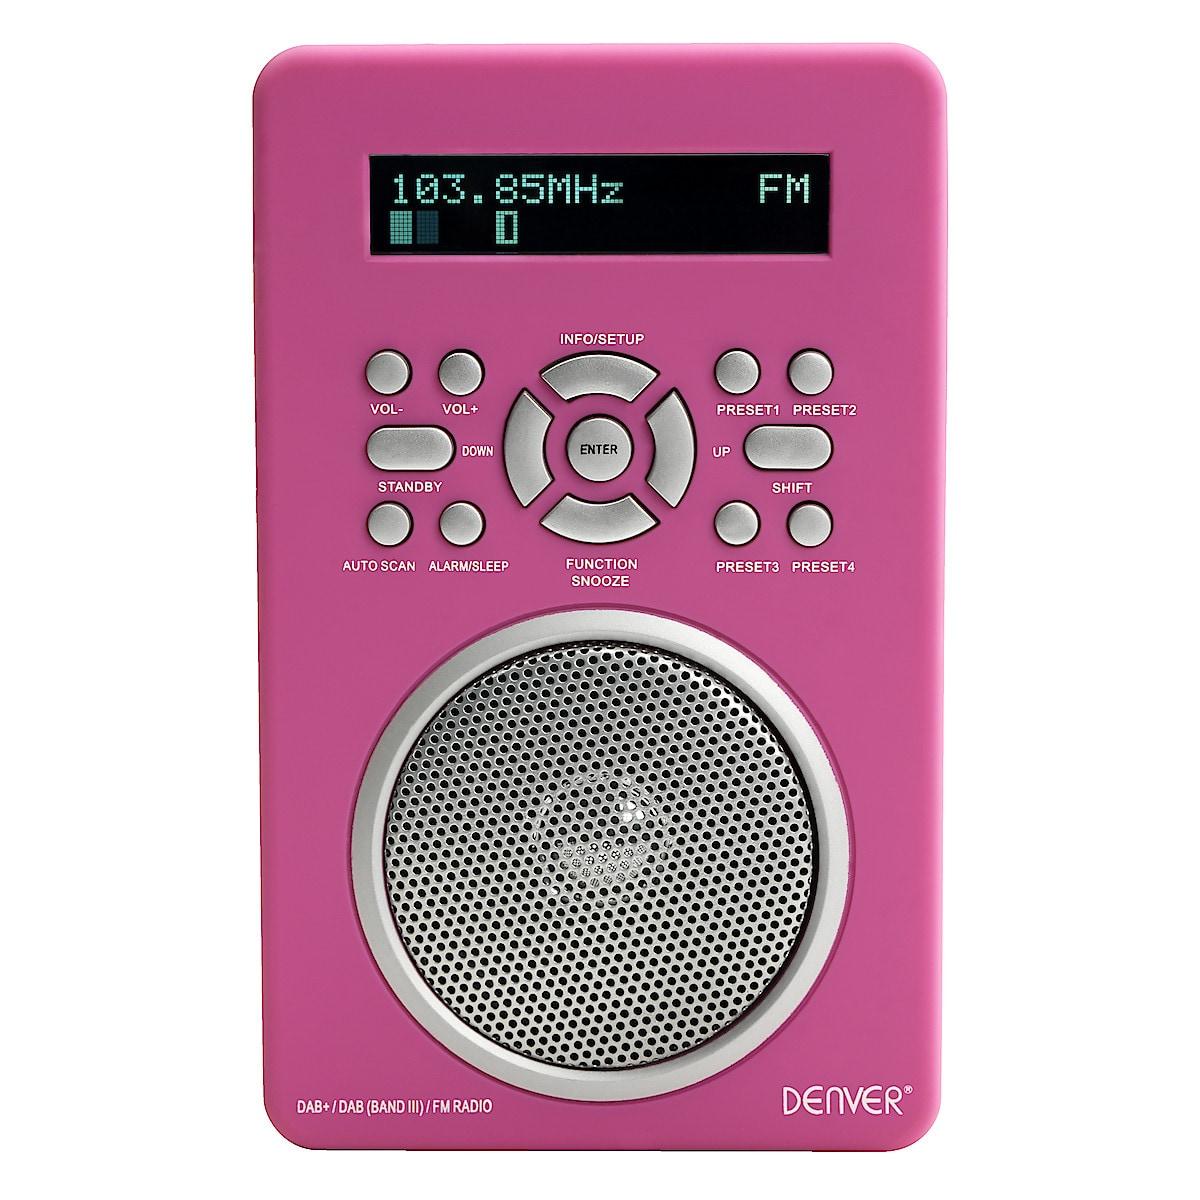 DAB/FM-radio/MP3-högtalare Denver DAB-43C PLUS.